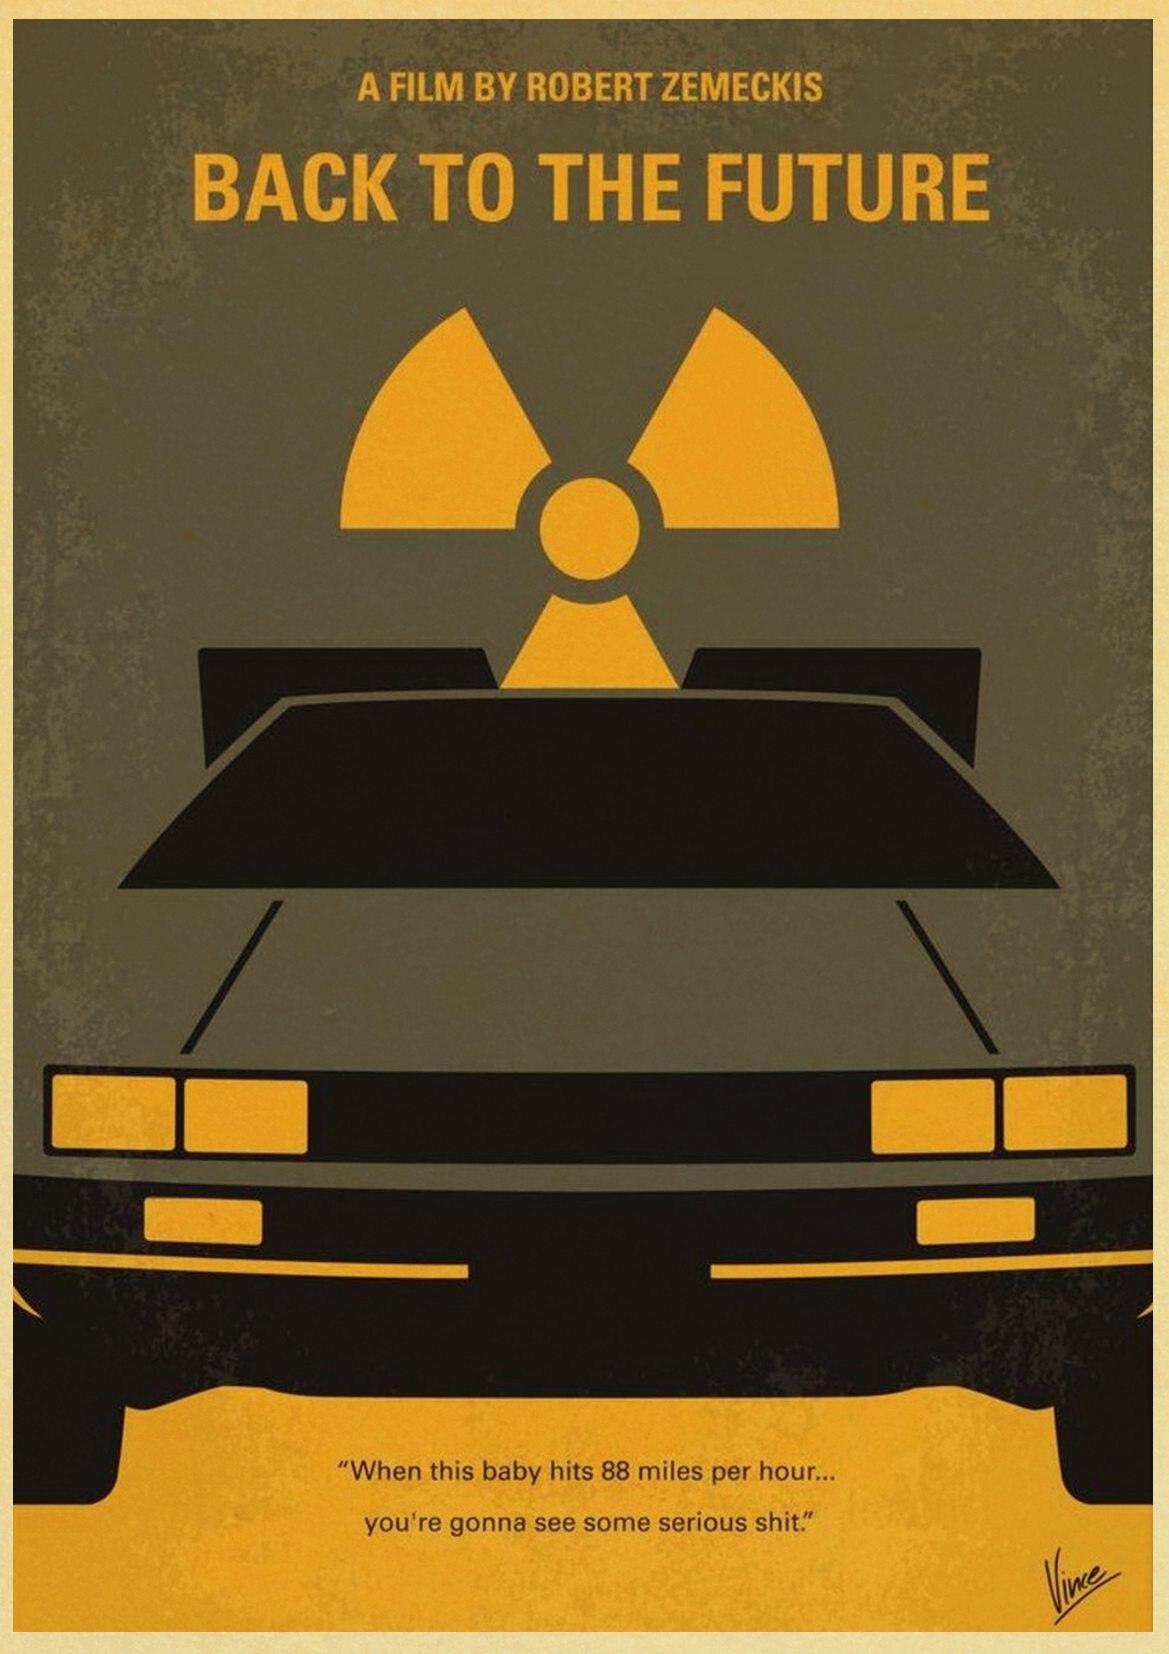 HTB1wvmIc26TBKNjSZJiq6zKVFXaO Sci-fi Back to The Future Film Propaganda Retro Kraft Poster Decorative DIY Wall Canvas Sticker Home Bar Art Posters Decor